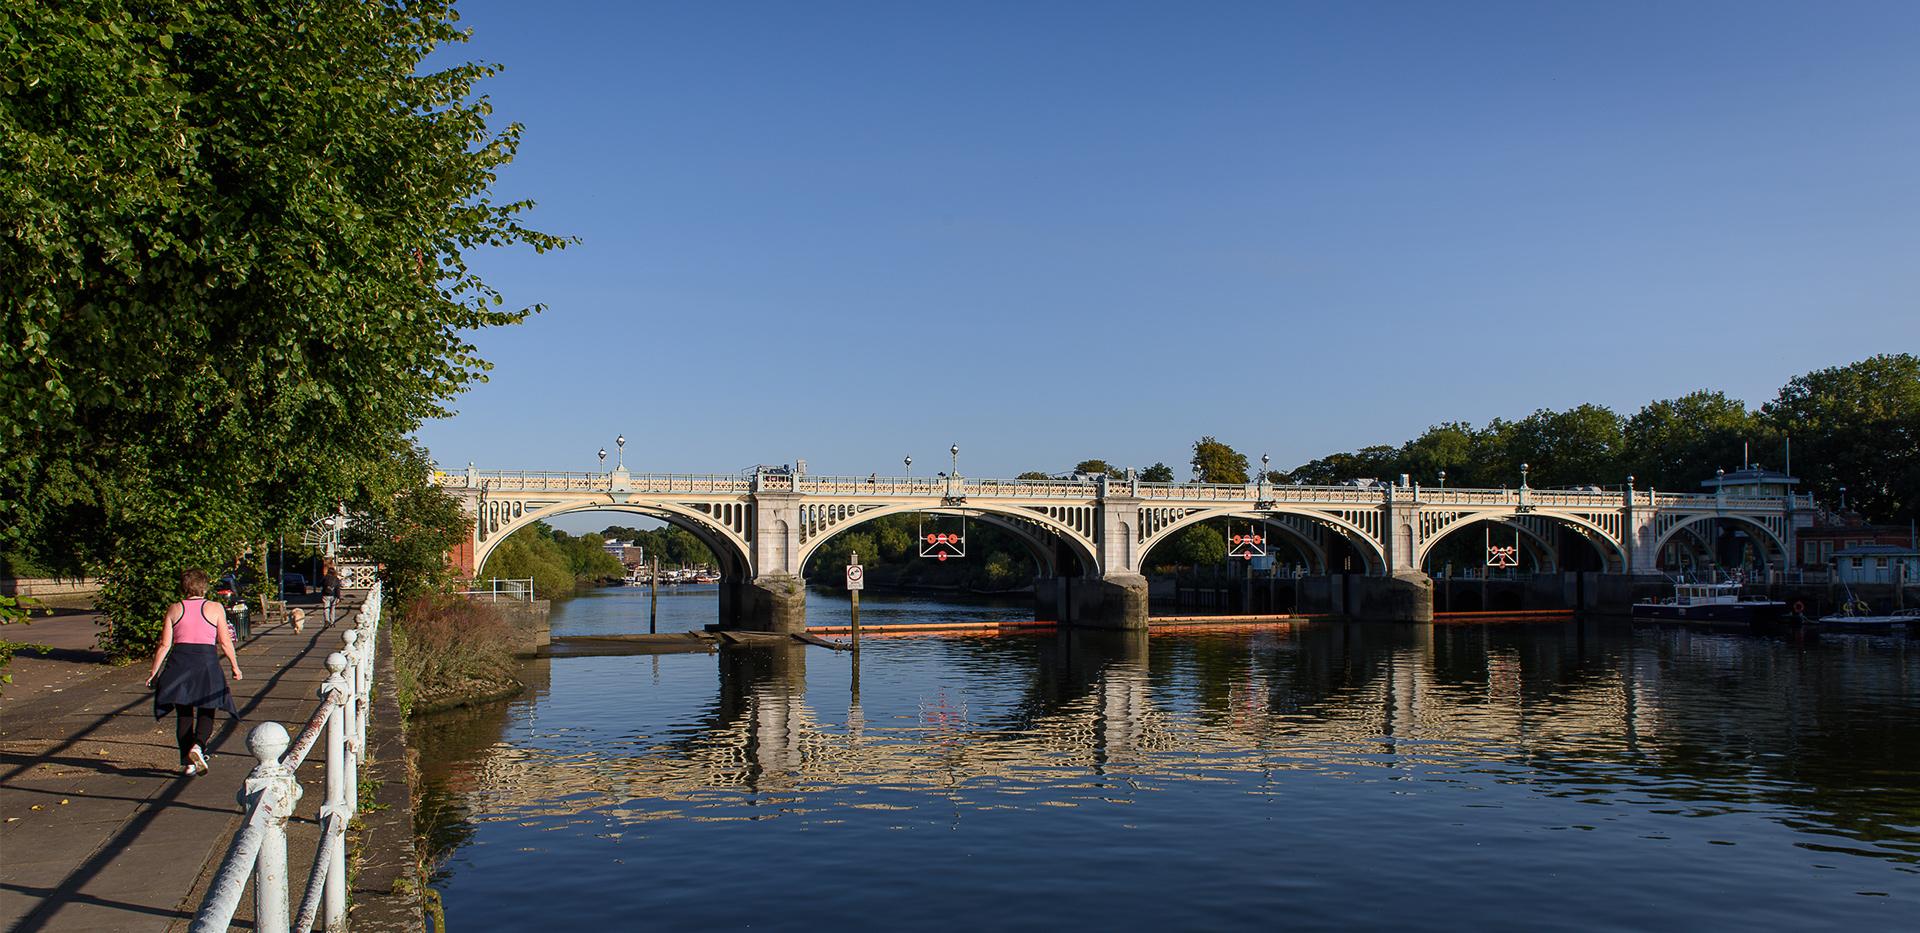 St James, Fitzroy Gate, Isleworth bridge